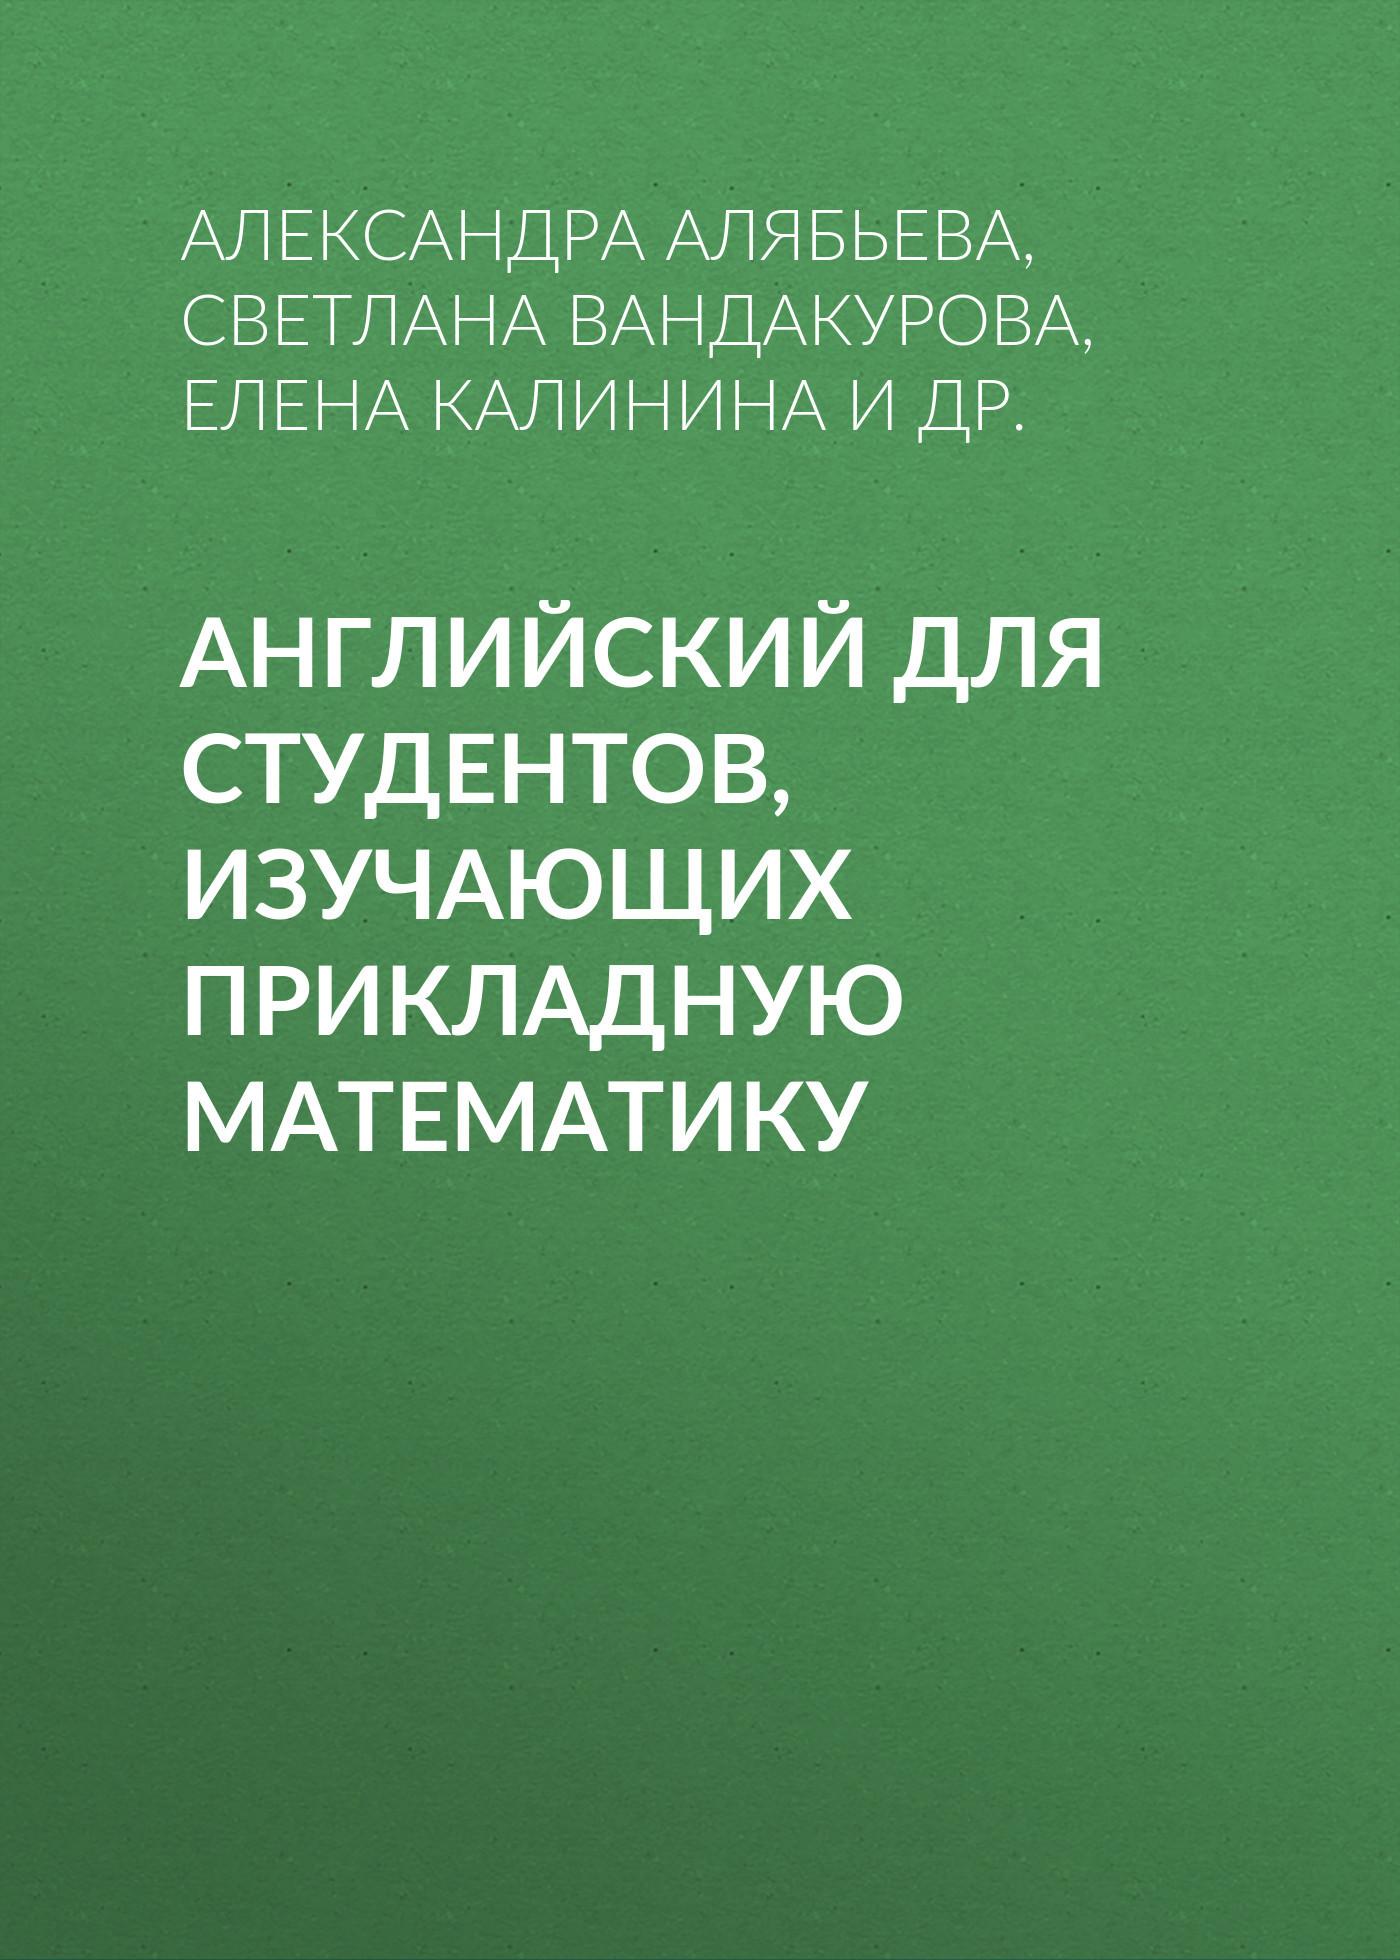 Елена Калинина бесплатно